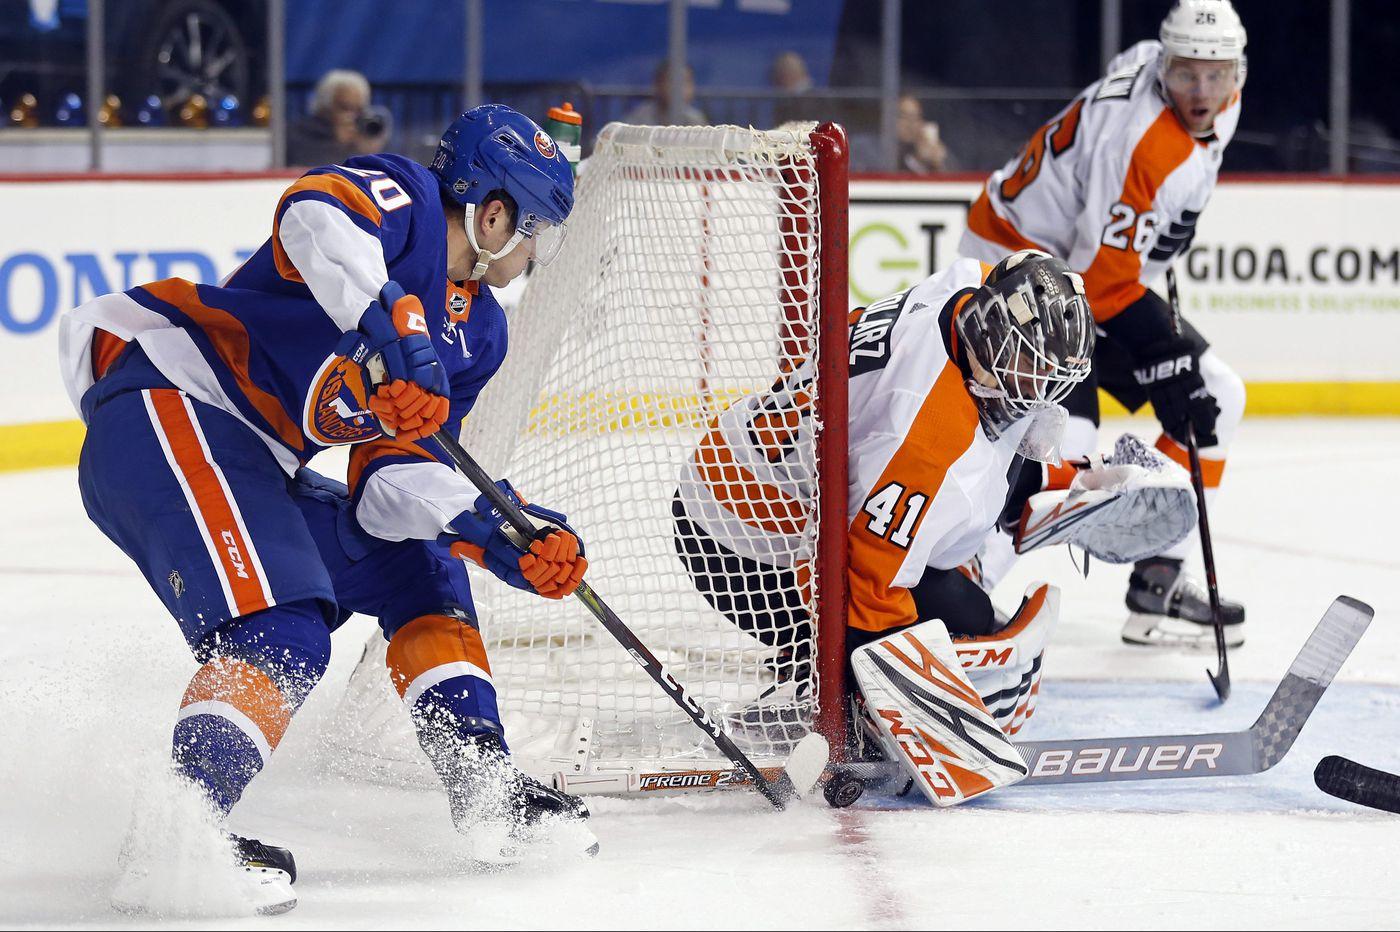 Flyers goalie hopeful Anthony Stolarz impressive in 5-1 win over Islanders